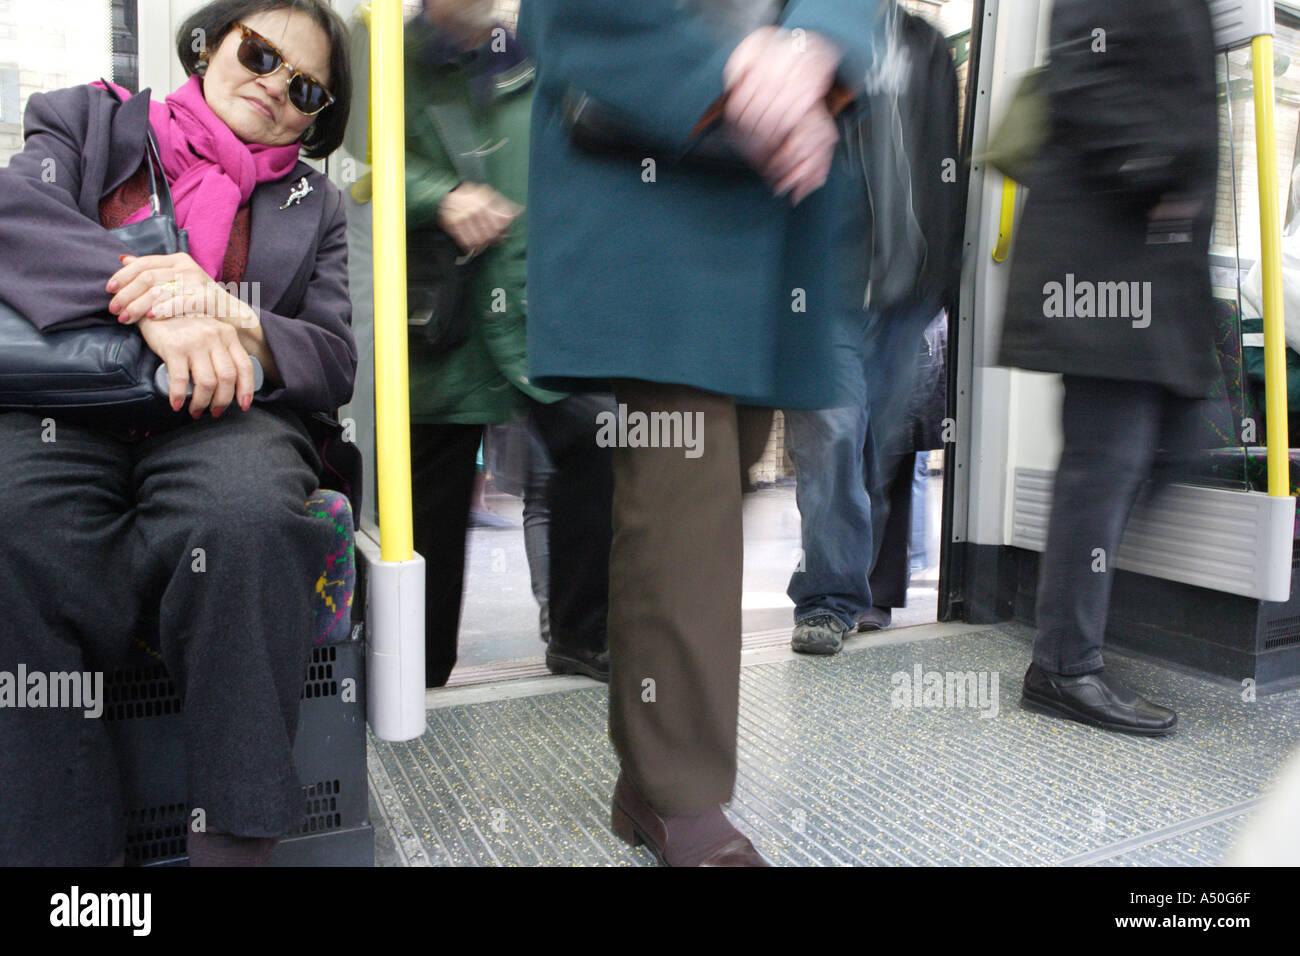 Commuters boarding a Tube train London England - Stock Image